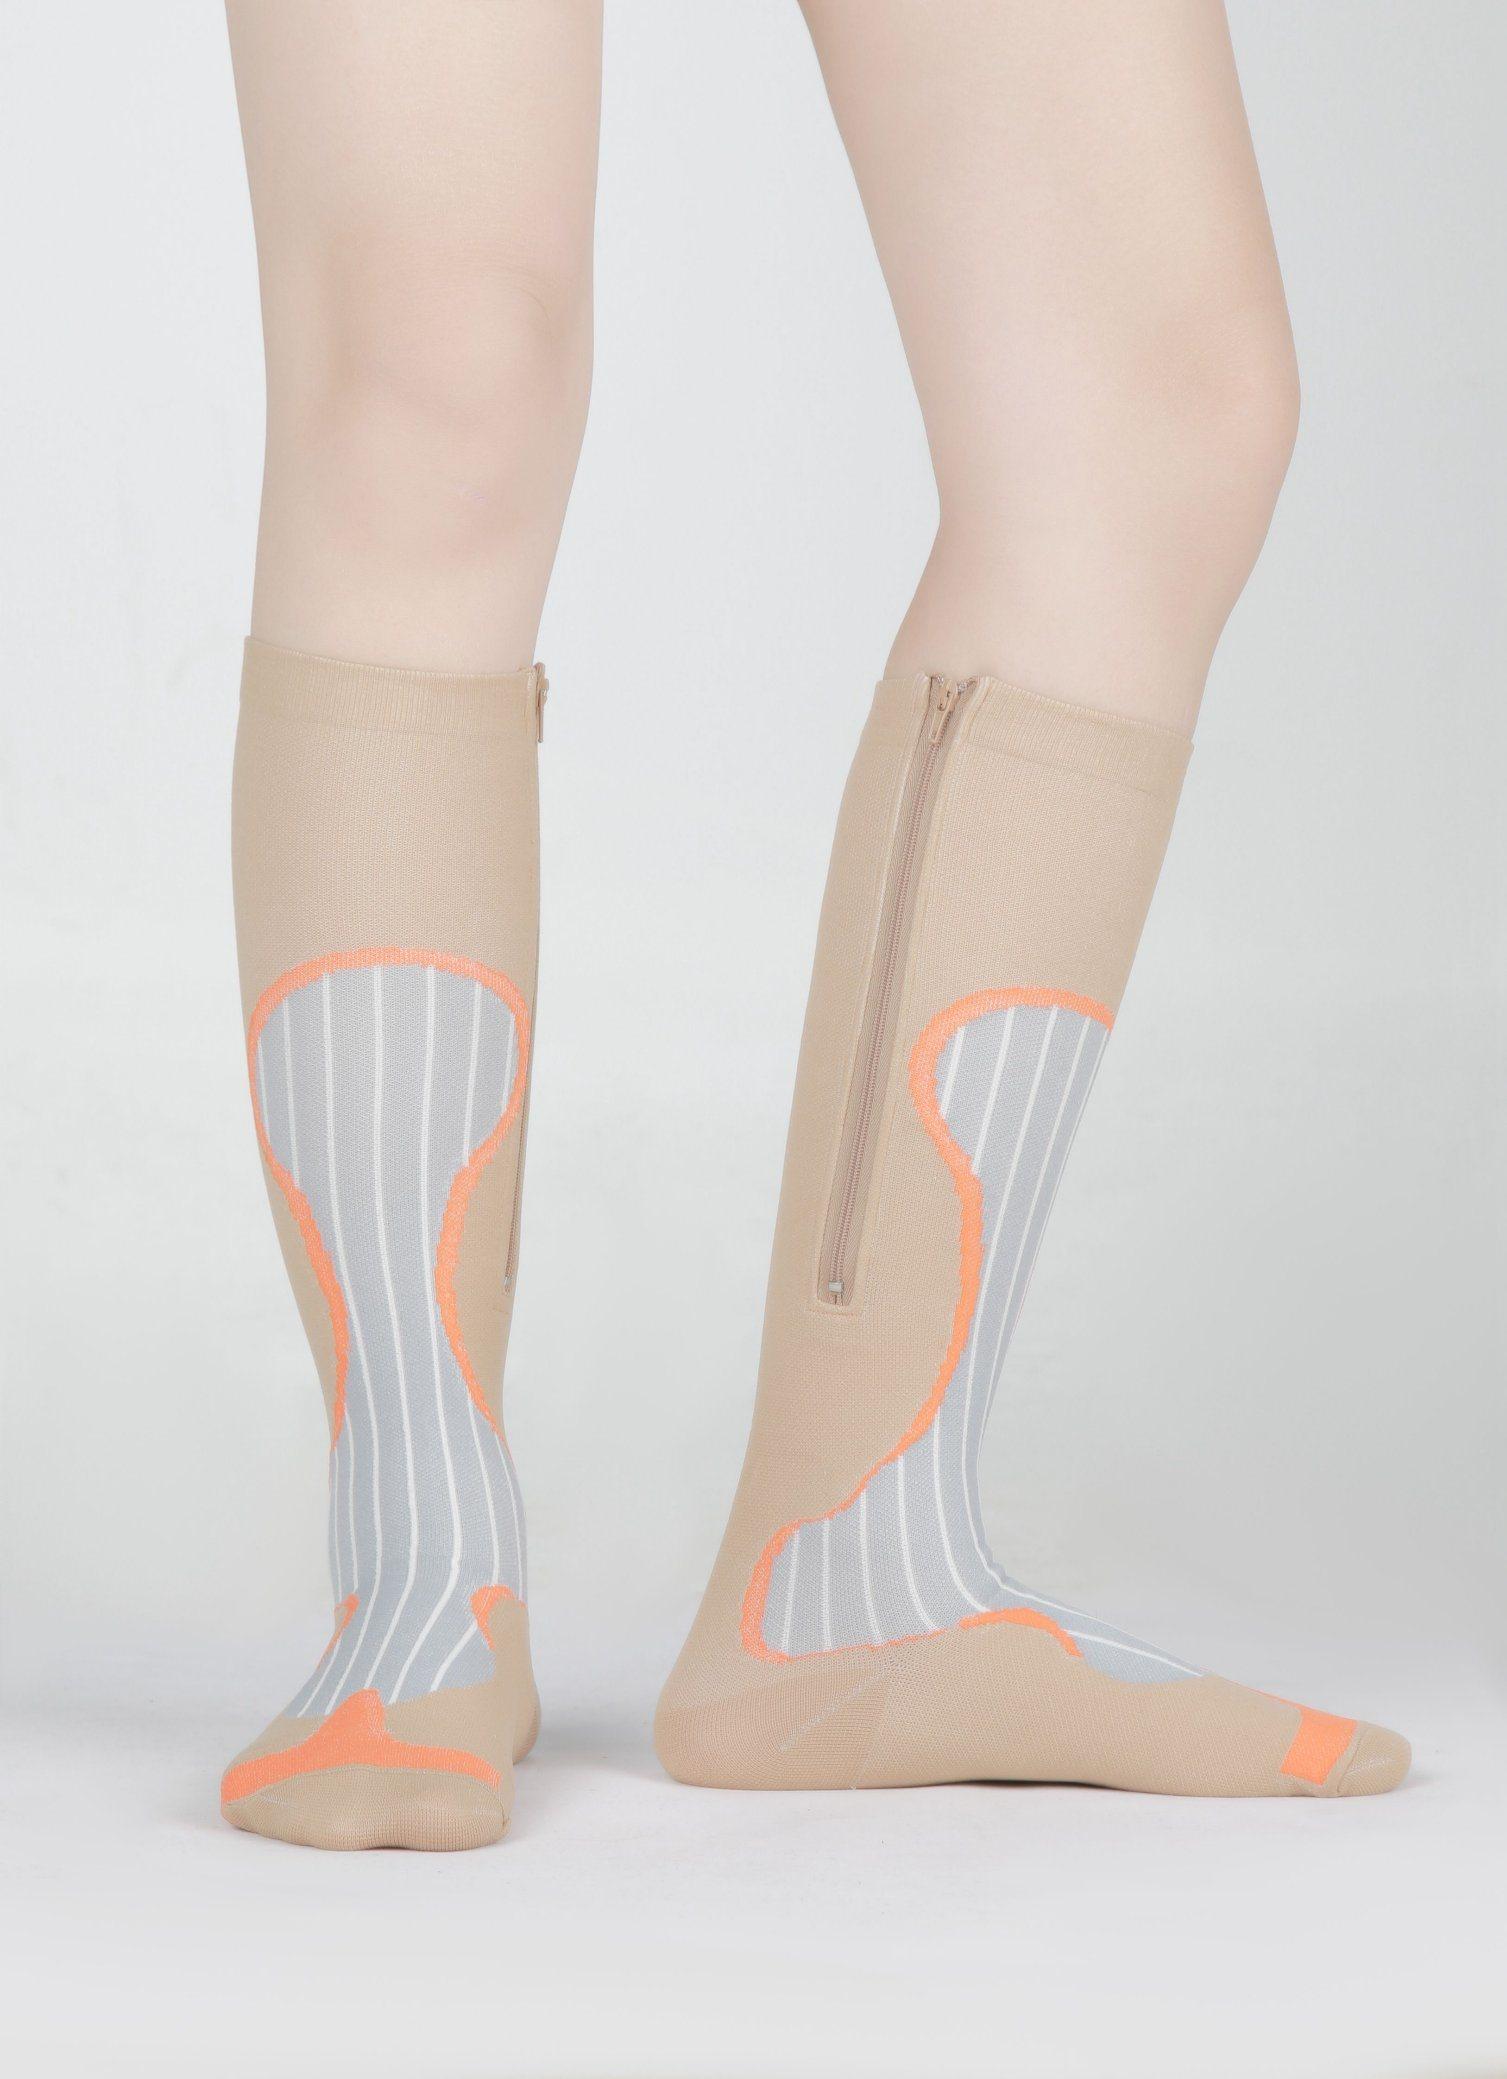 71cdaf9049 China Manufacturer Knee High Athletic Sport Graduated Compression Socks for Varicose  Veins - China Compression Socks, Sport Socks